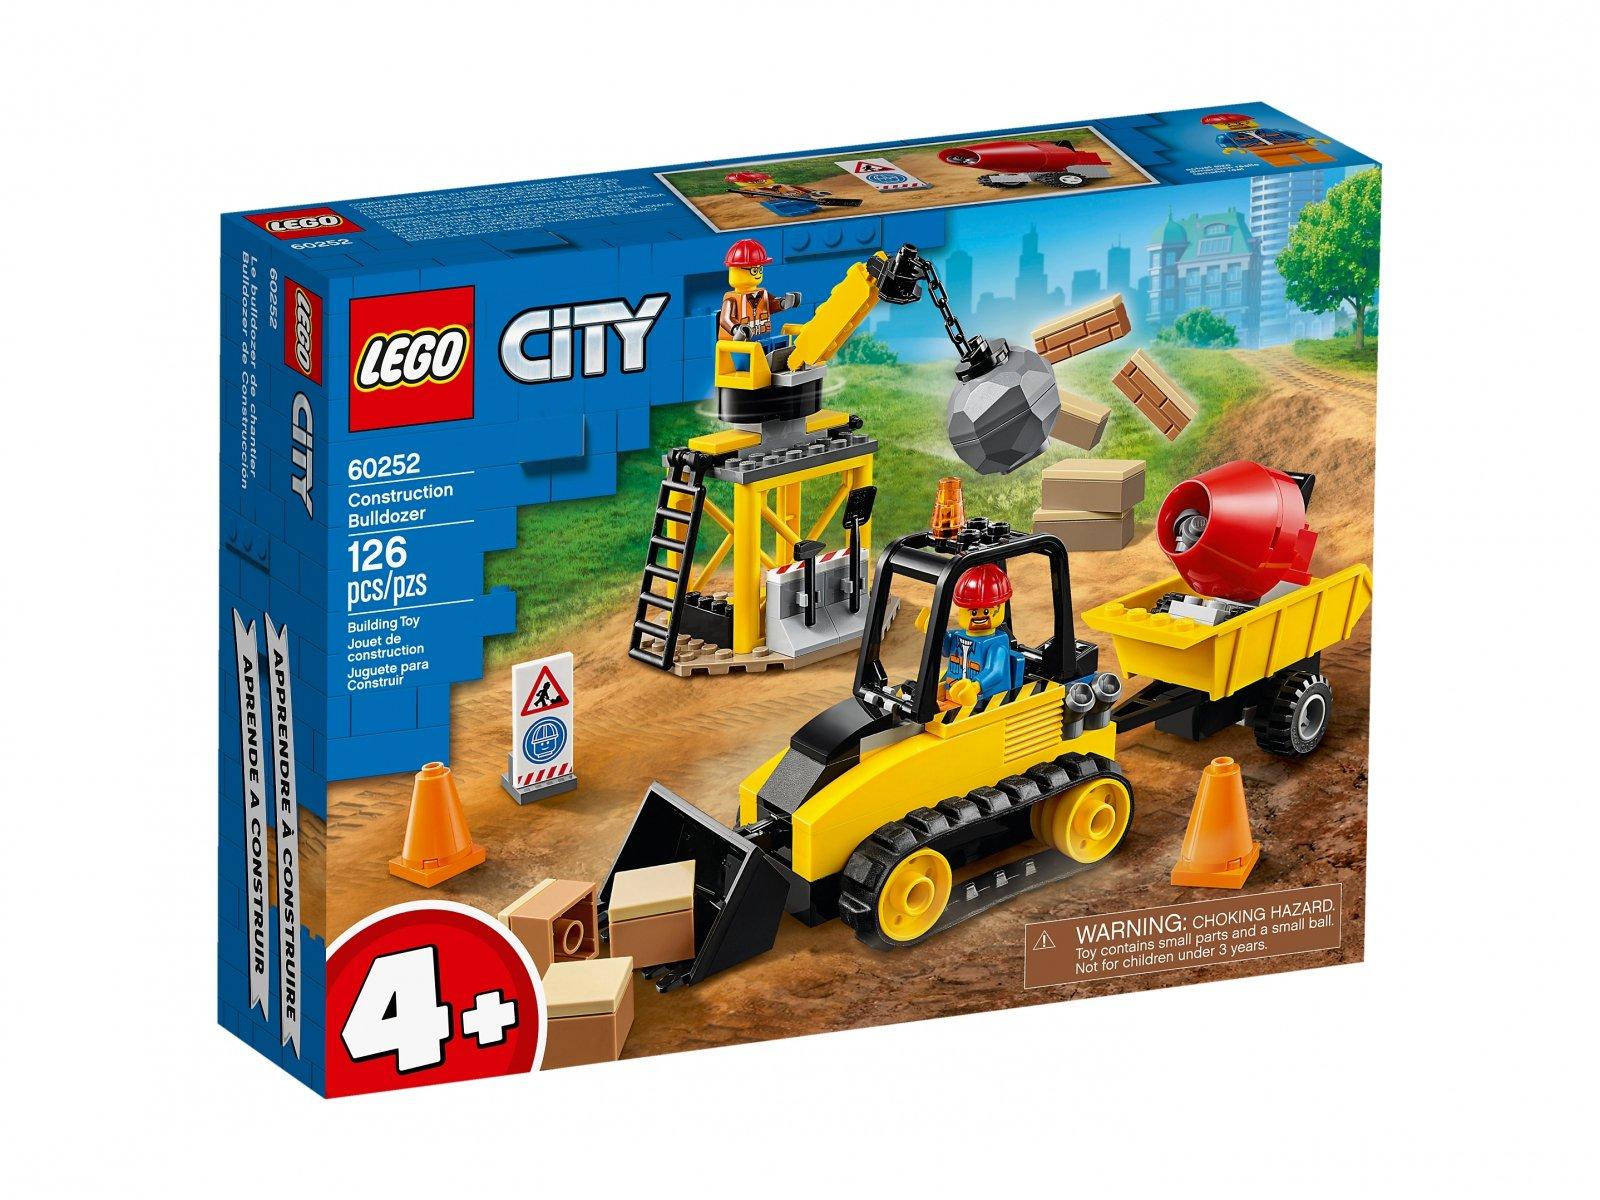 LEGO 60252 City Buldożer budowlany